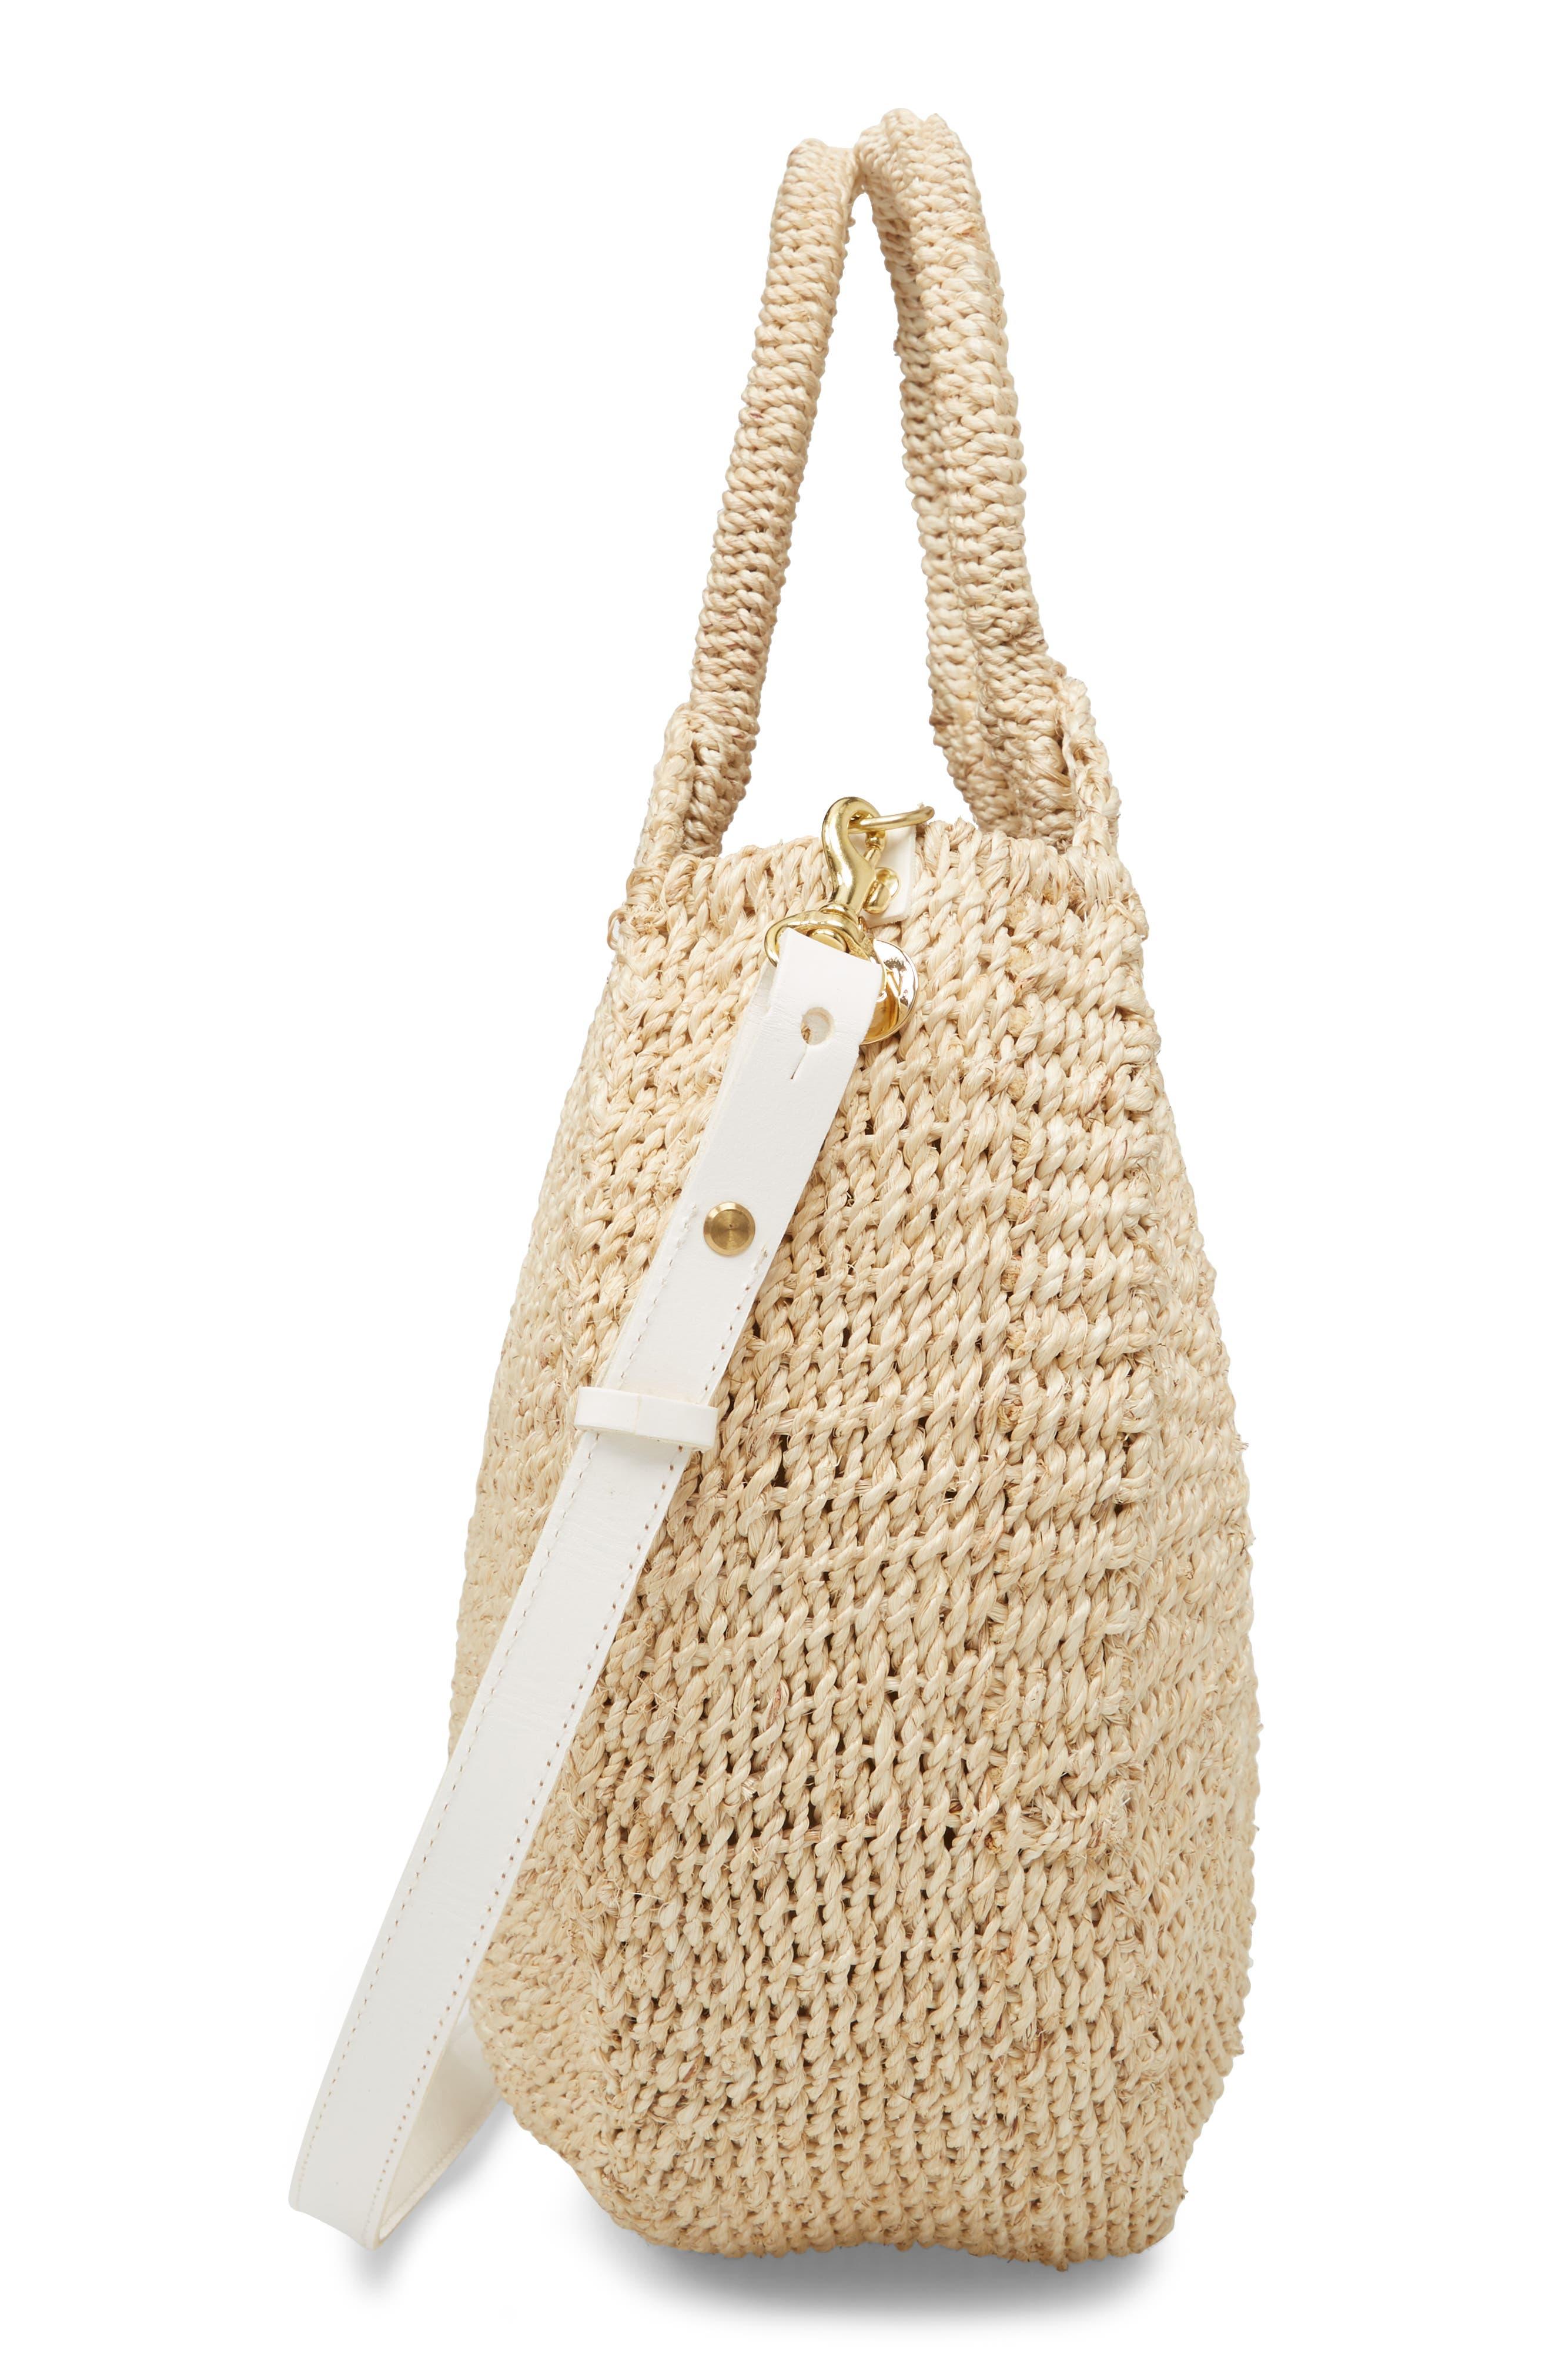 Alice Woven Sisal Straw Bag,                             Alternate thumbnail 4, color,                             Natural